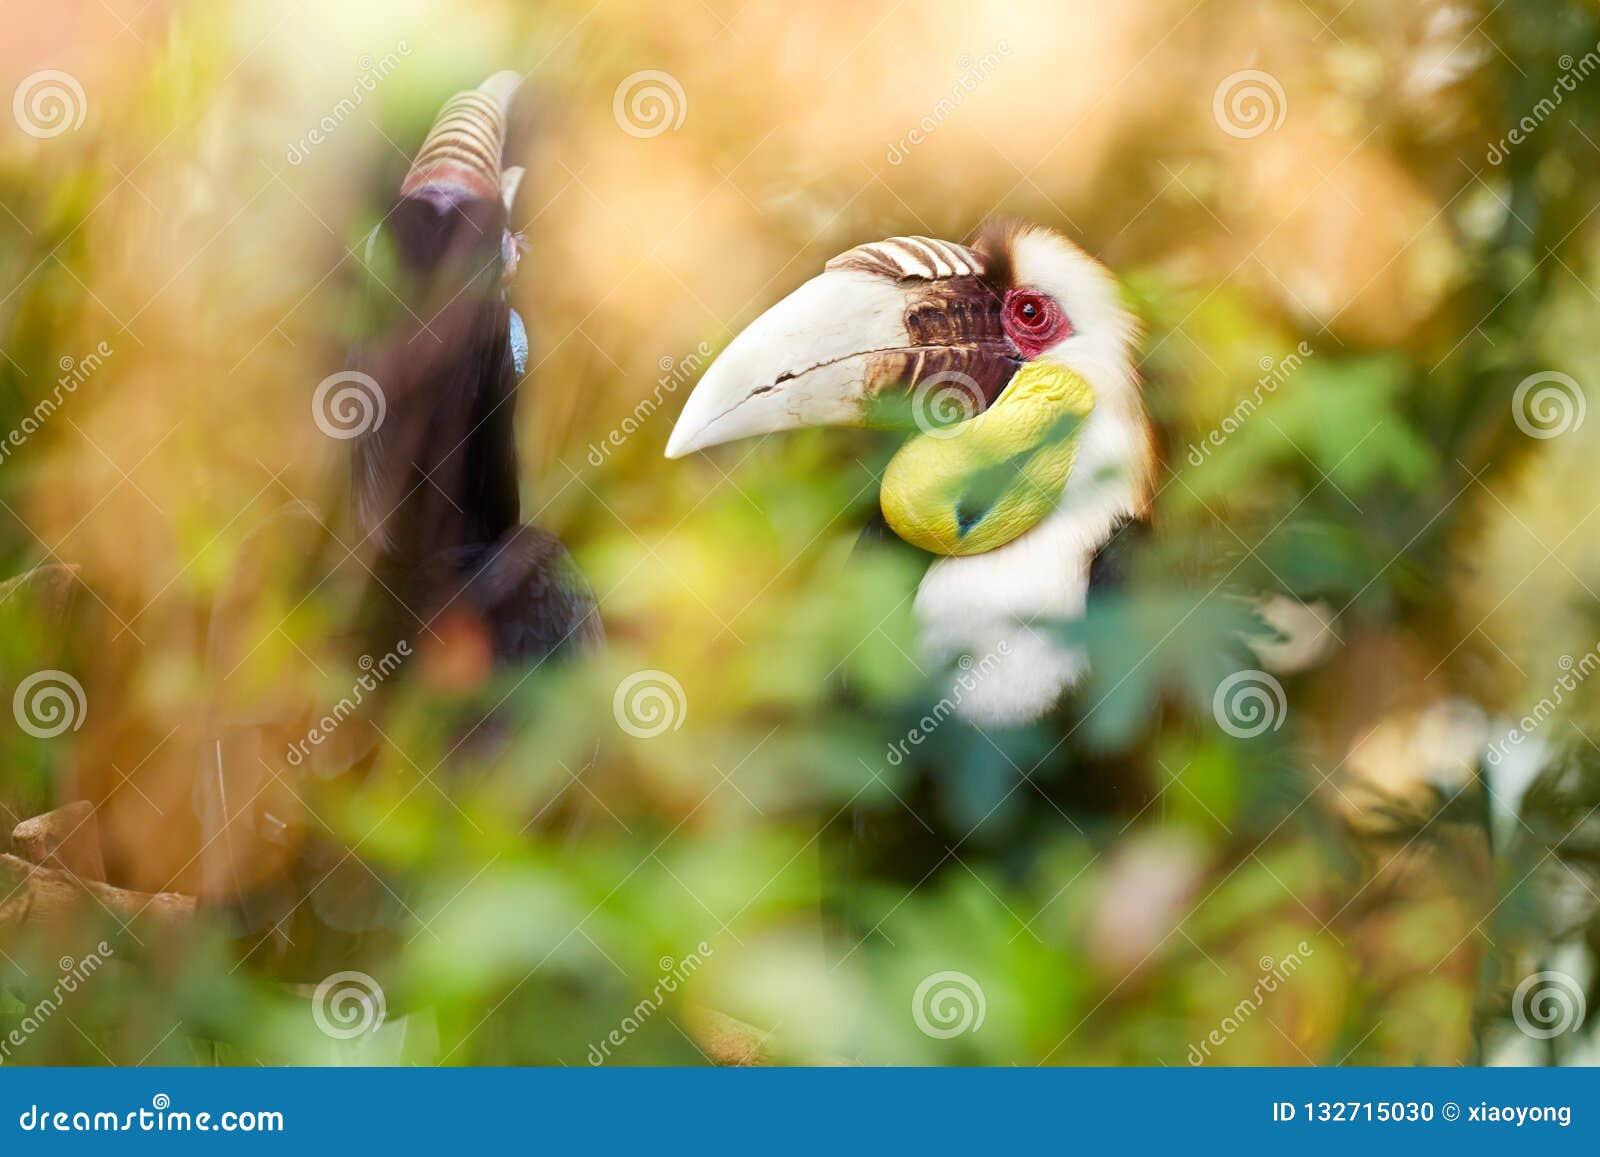 Great hornbill in rain forest